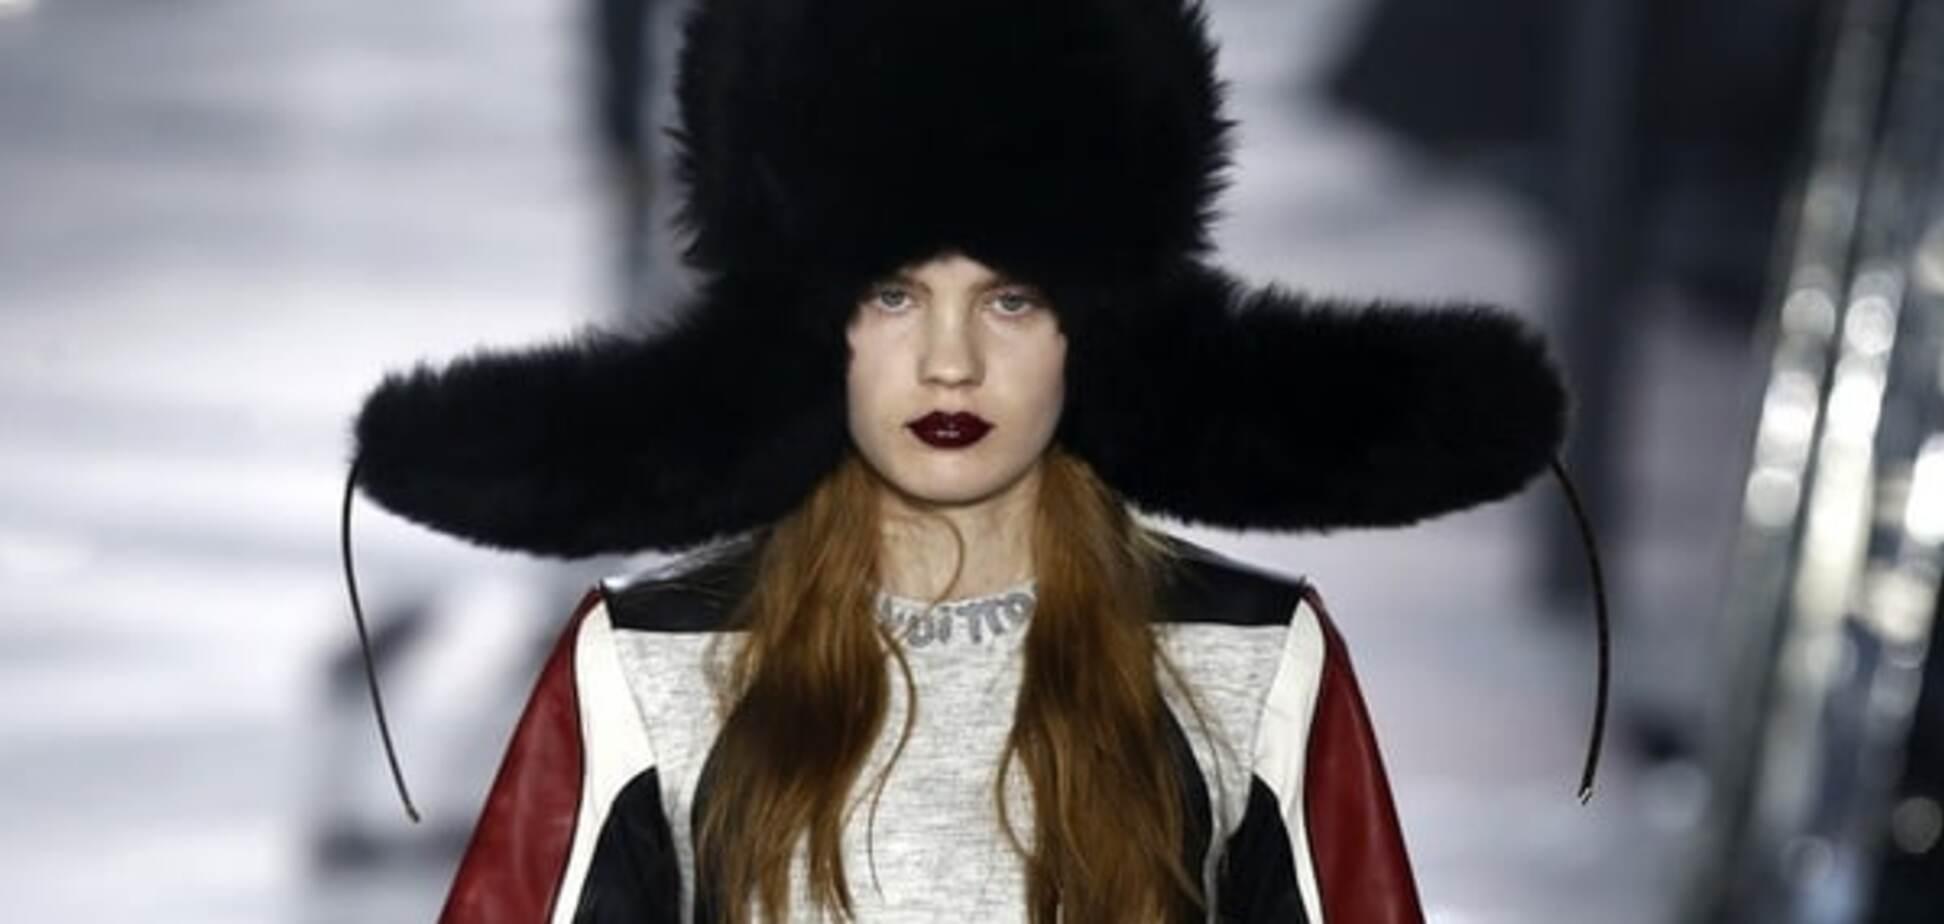 Louis Vuitton на Неделе моды в Париже представил огромную шапку-ушанку